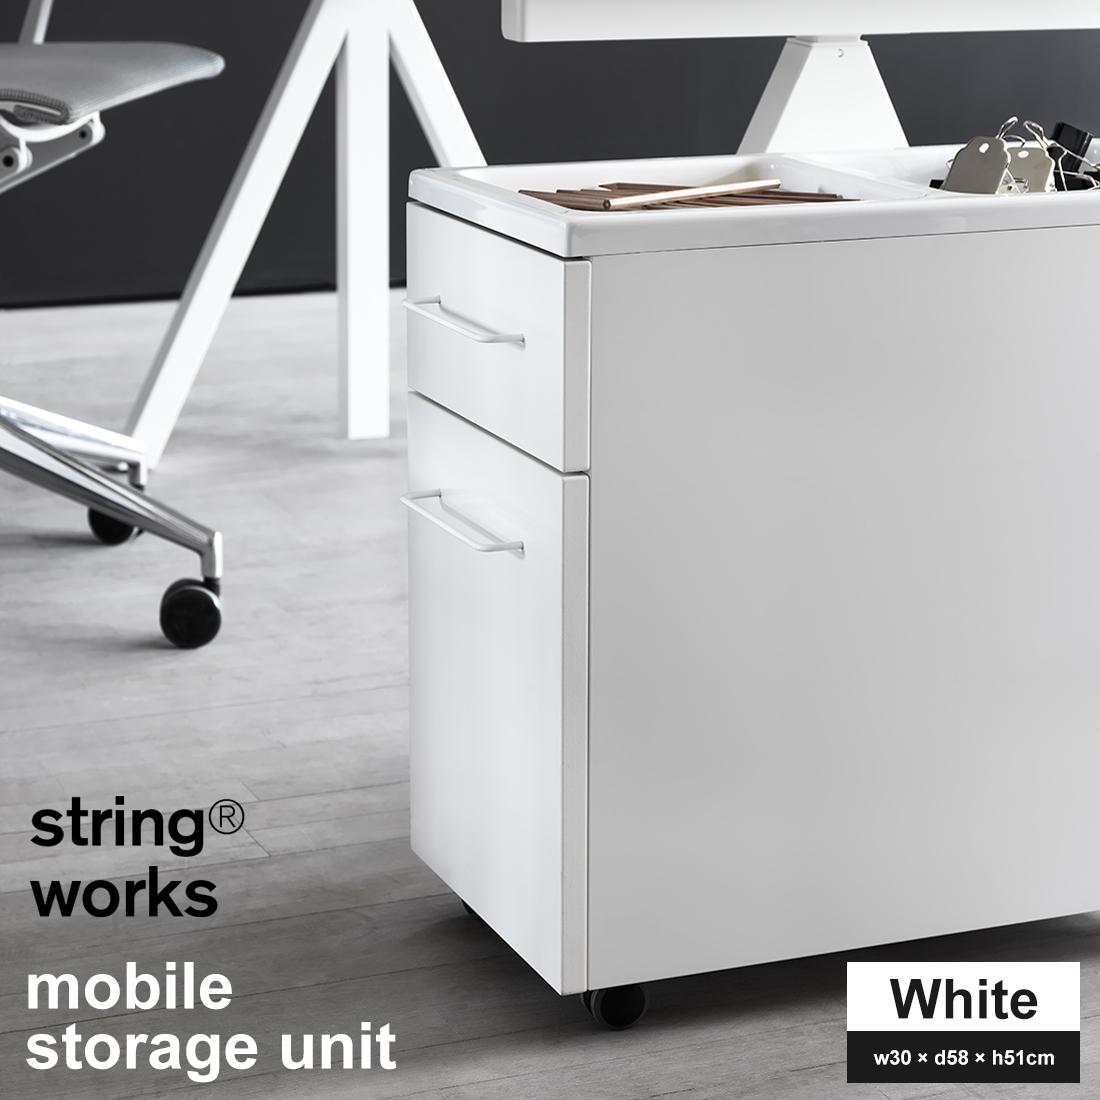 【string ストリング】string works Moble cabinet ストリング ワークス モバイルキャビネット ホワイト机 テーブル 作業台 折りたたみ式 折り畳みテーブル ダイニングテーブル